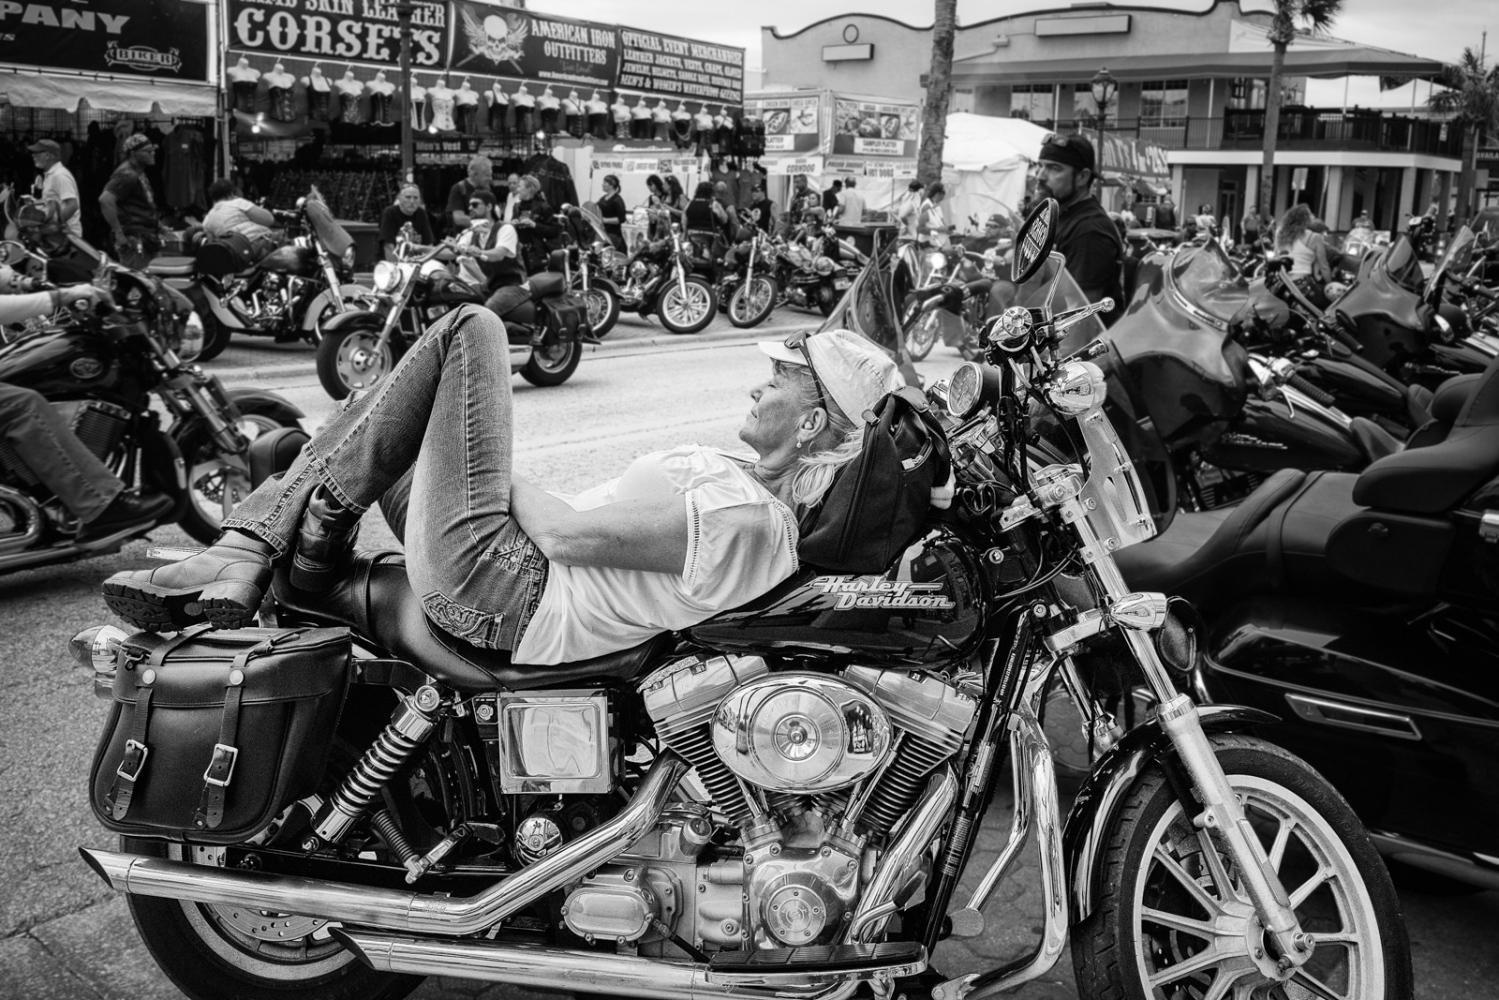 Main Street Biketoberfest, Daytona Beach, Florida